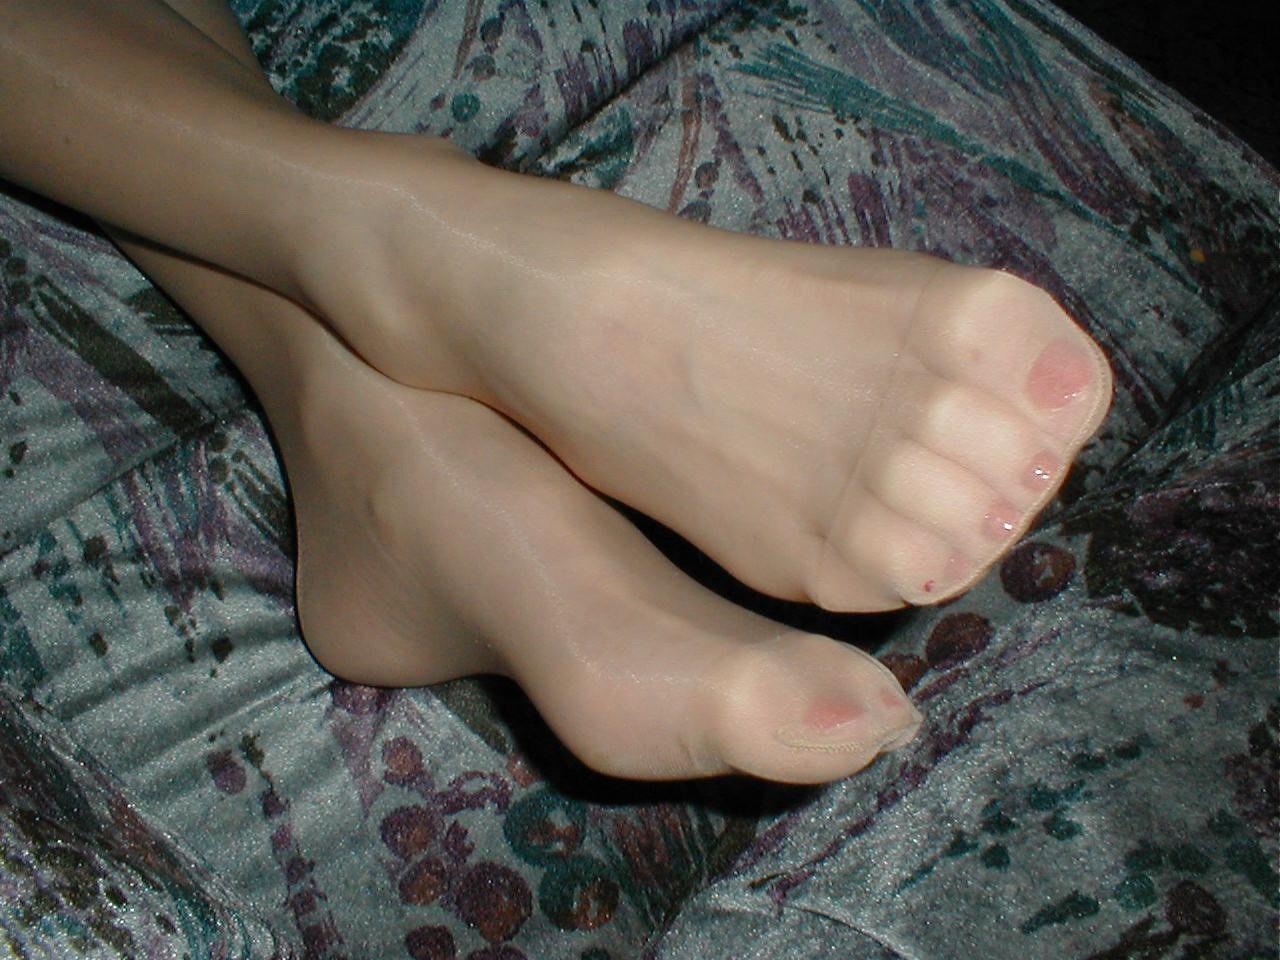 http://pbs-2.adult-empire.com/85/8570/020/pic/10.jpg